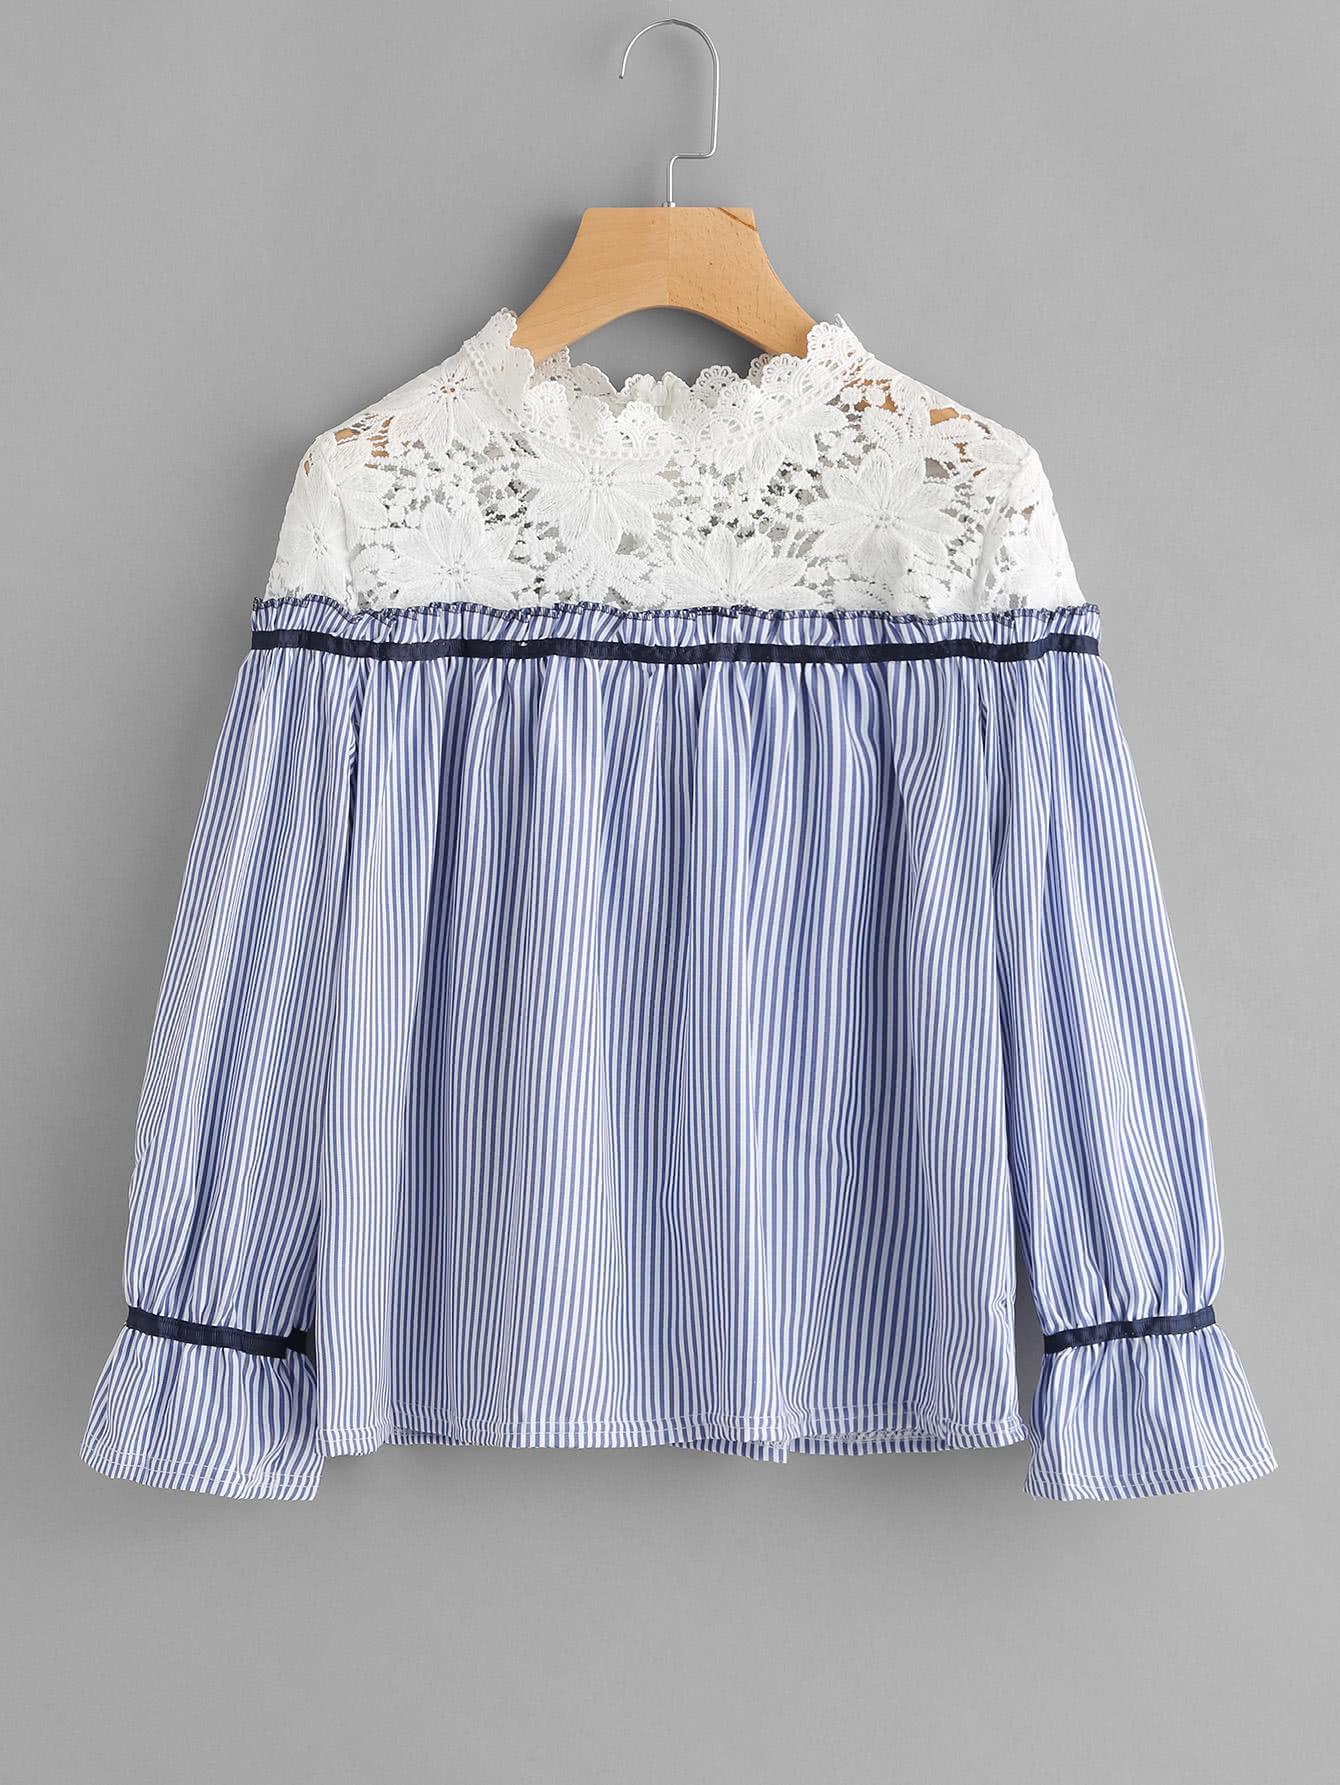 Contrast Crochet Lace Vertical Striped Blouse lace crochet contrast off shoulder stripe blouse